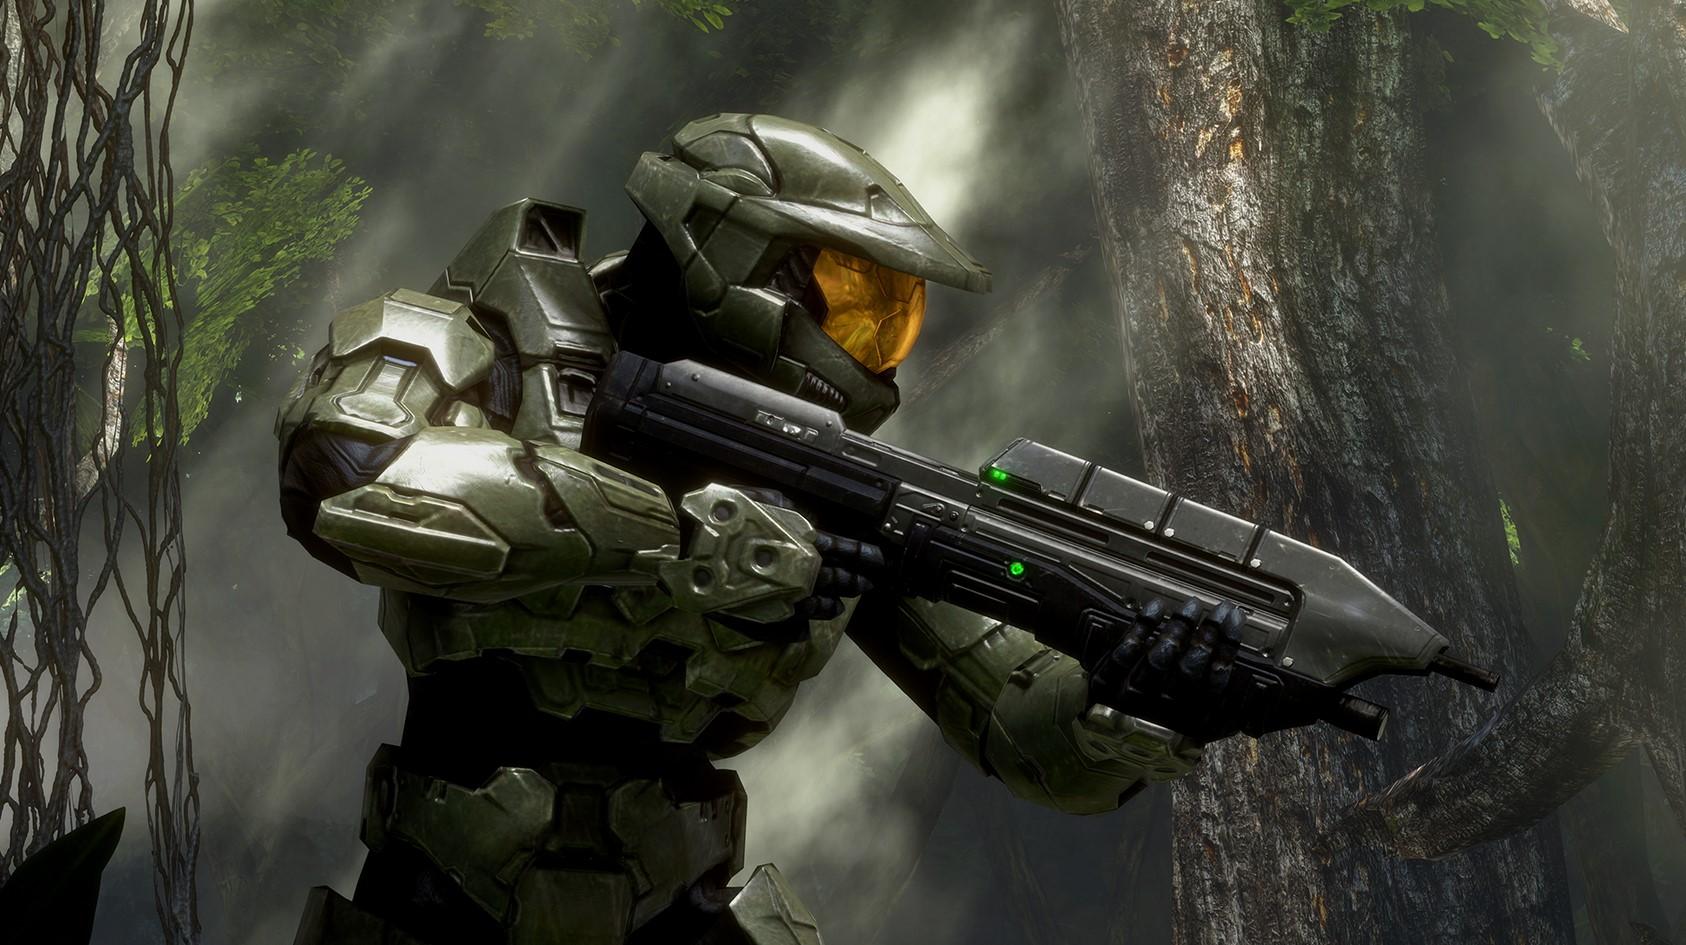 Halo 3 multiplayer